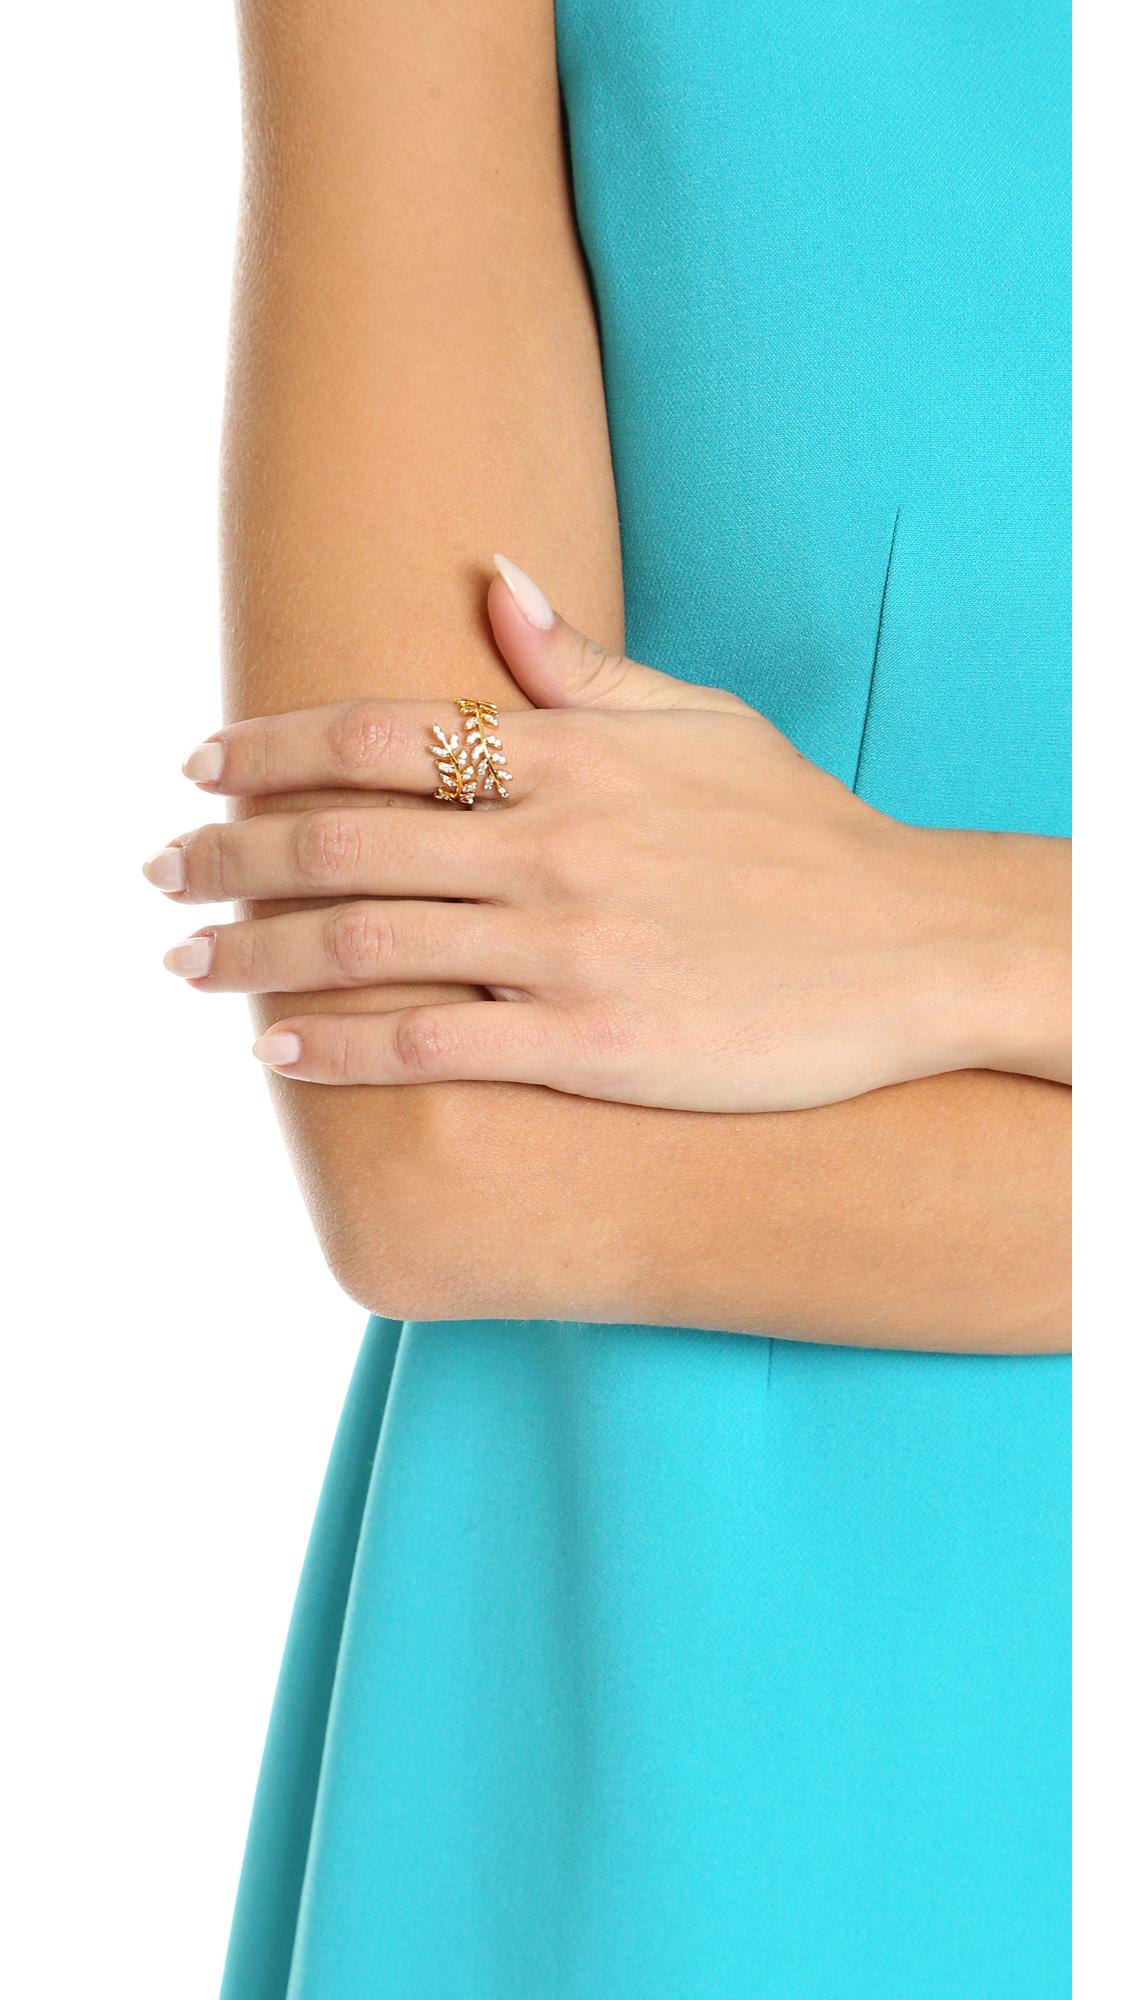 Gorjana Olympia Shimmer Wrap Ring in Metallic Gold mHd5PLC